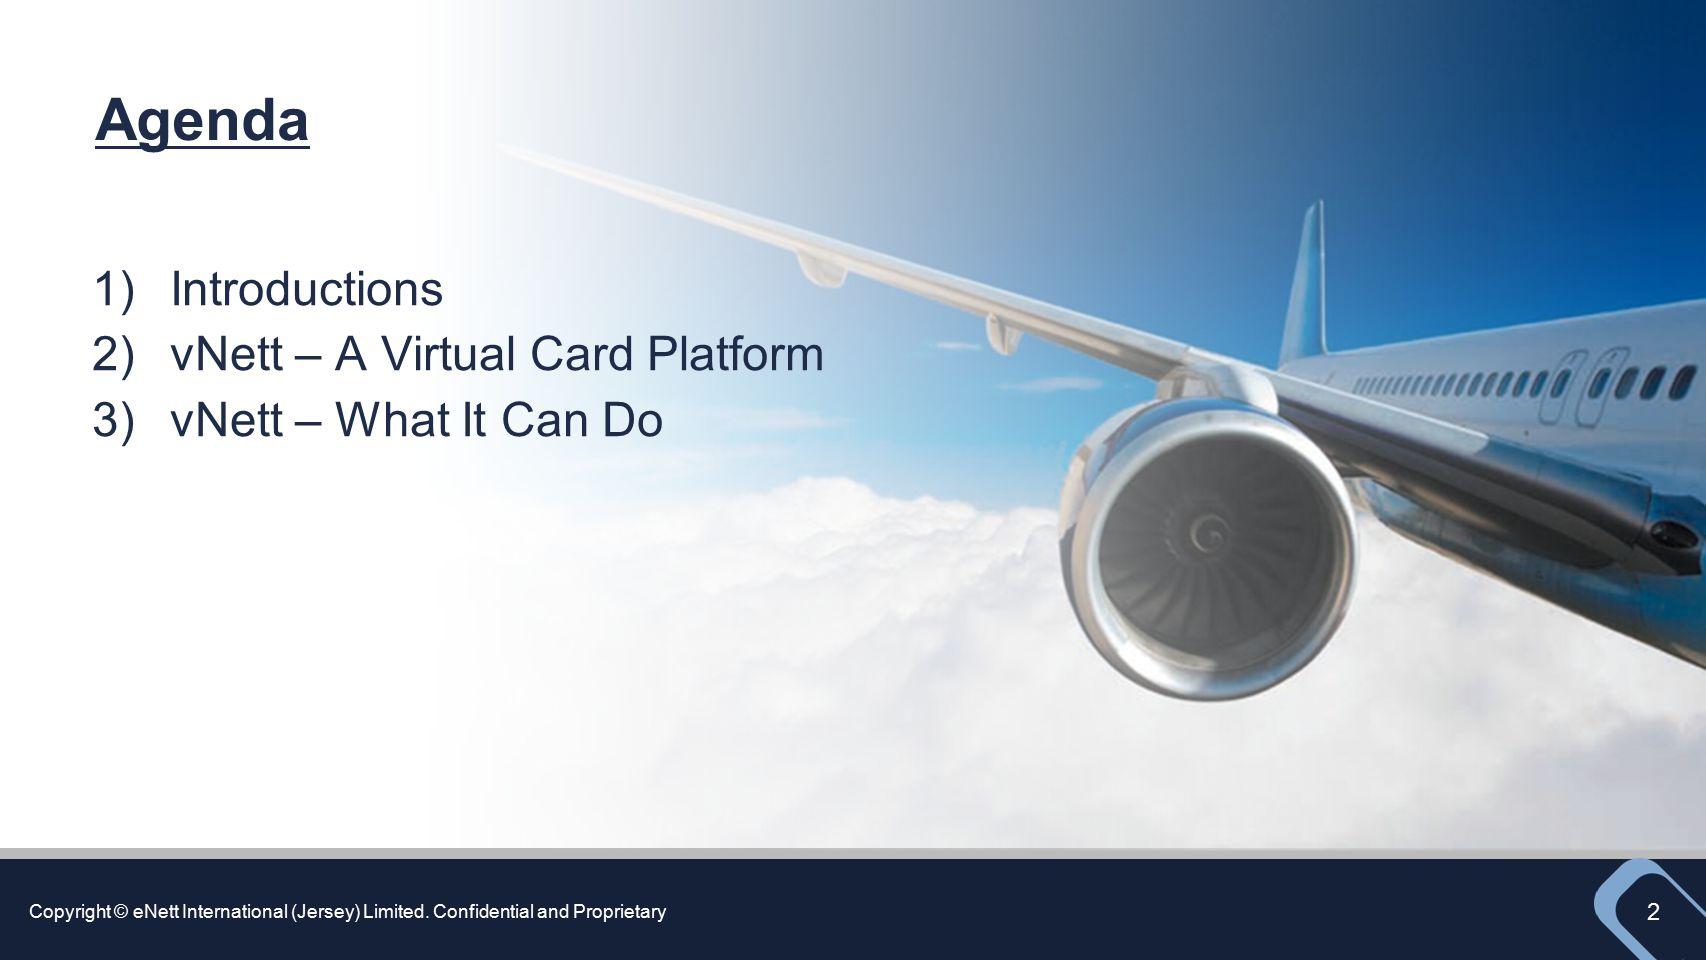 Copyright © eNett International (Jersey) Limited. Confidential and Proprietary 2 Agenda 1)Introductions 2)vNett – A Virtual Card Platform 3)vNett – Wh